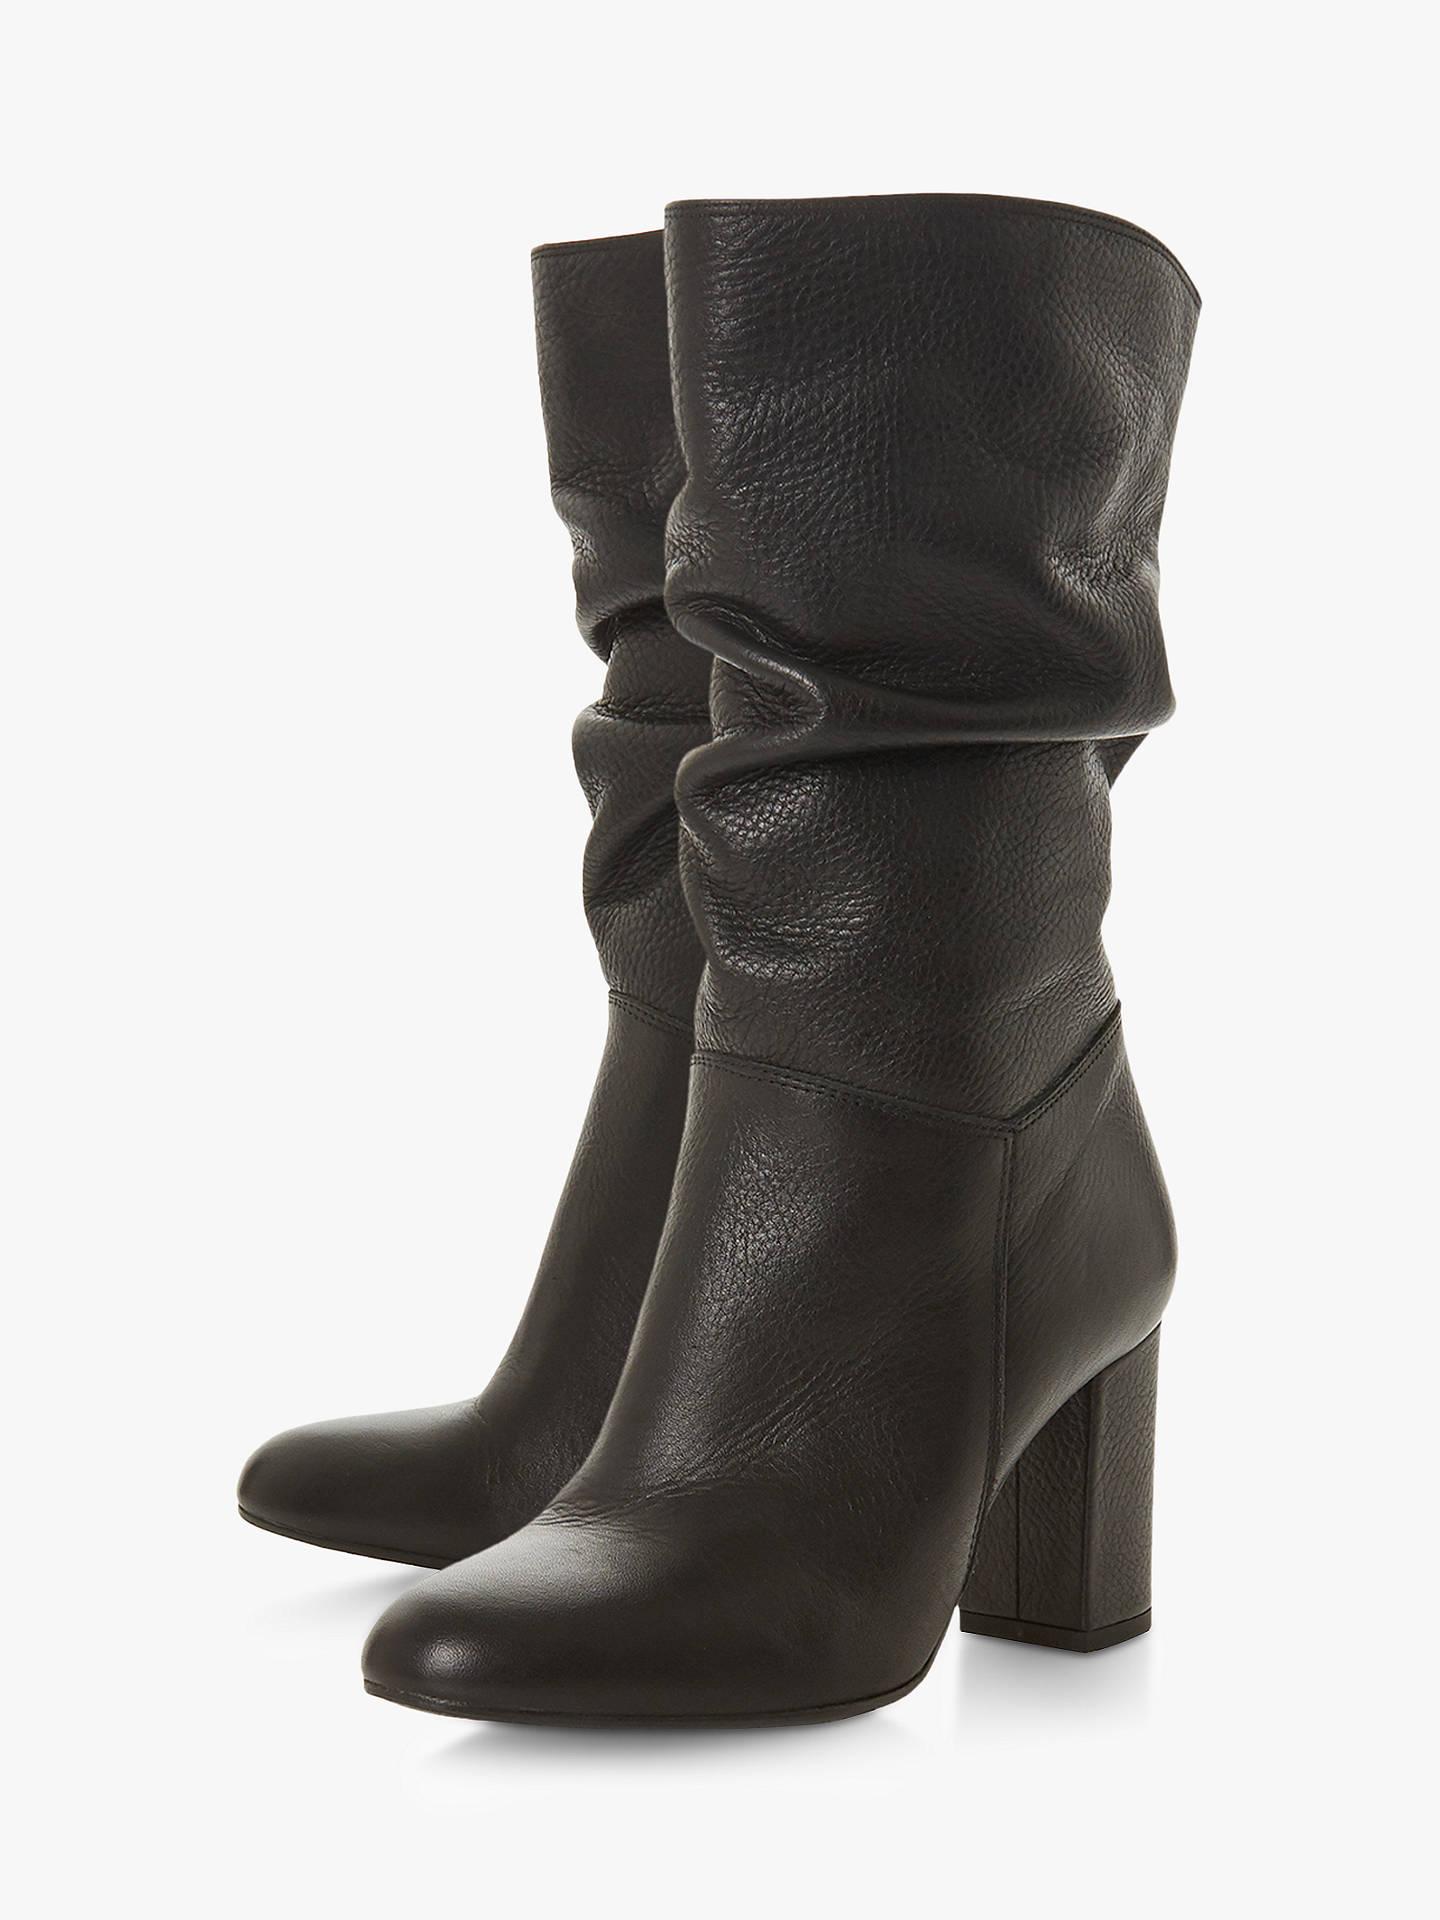 b18492b74d75 Buy Dune Rafaellie Ruched Block Heel Boots